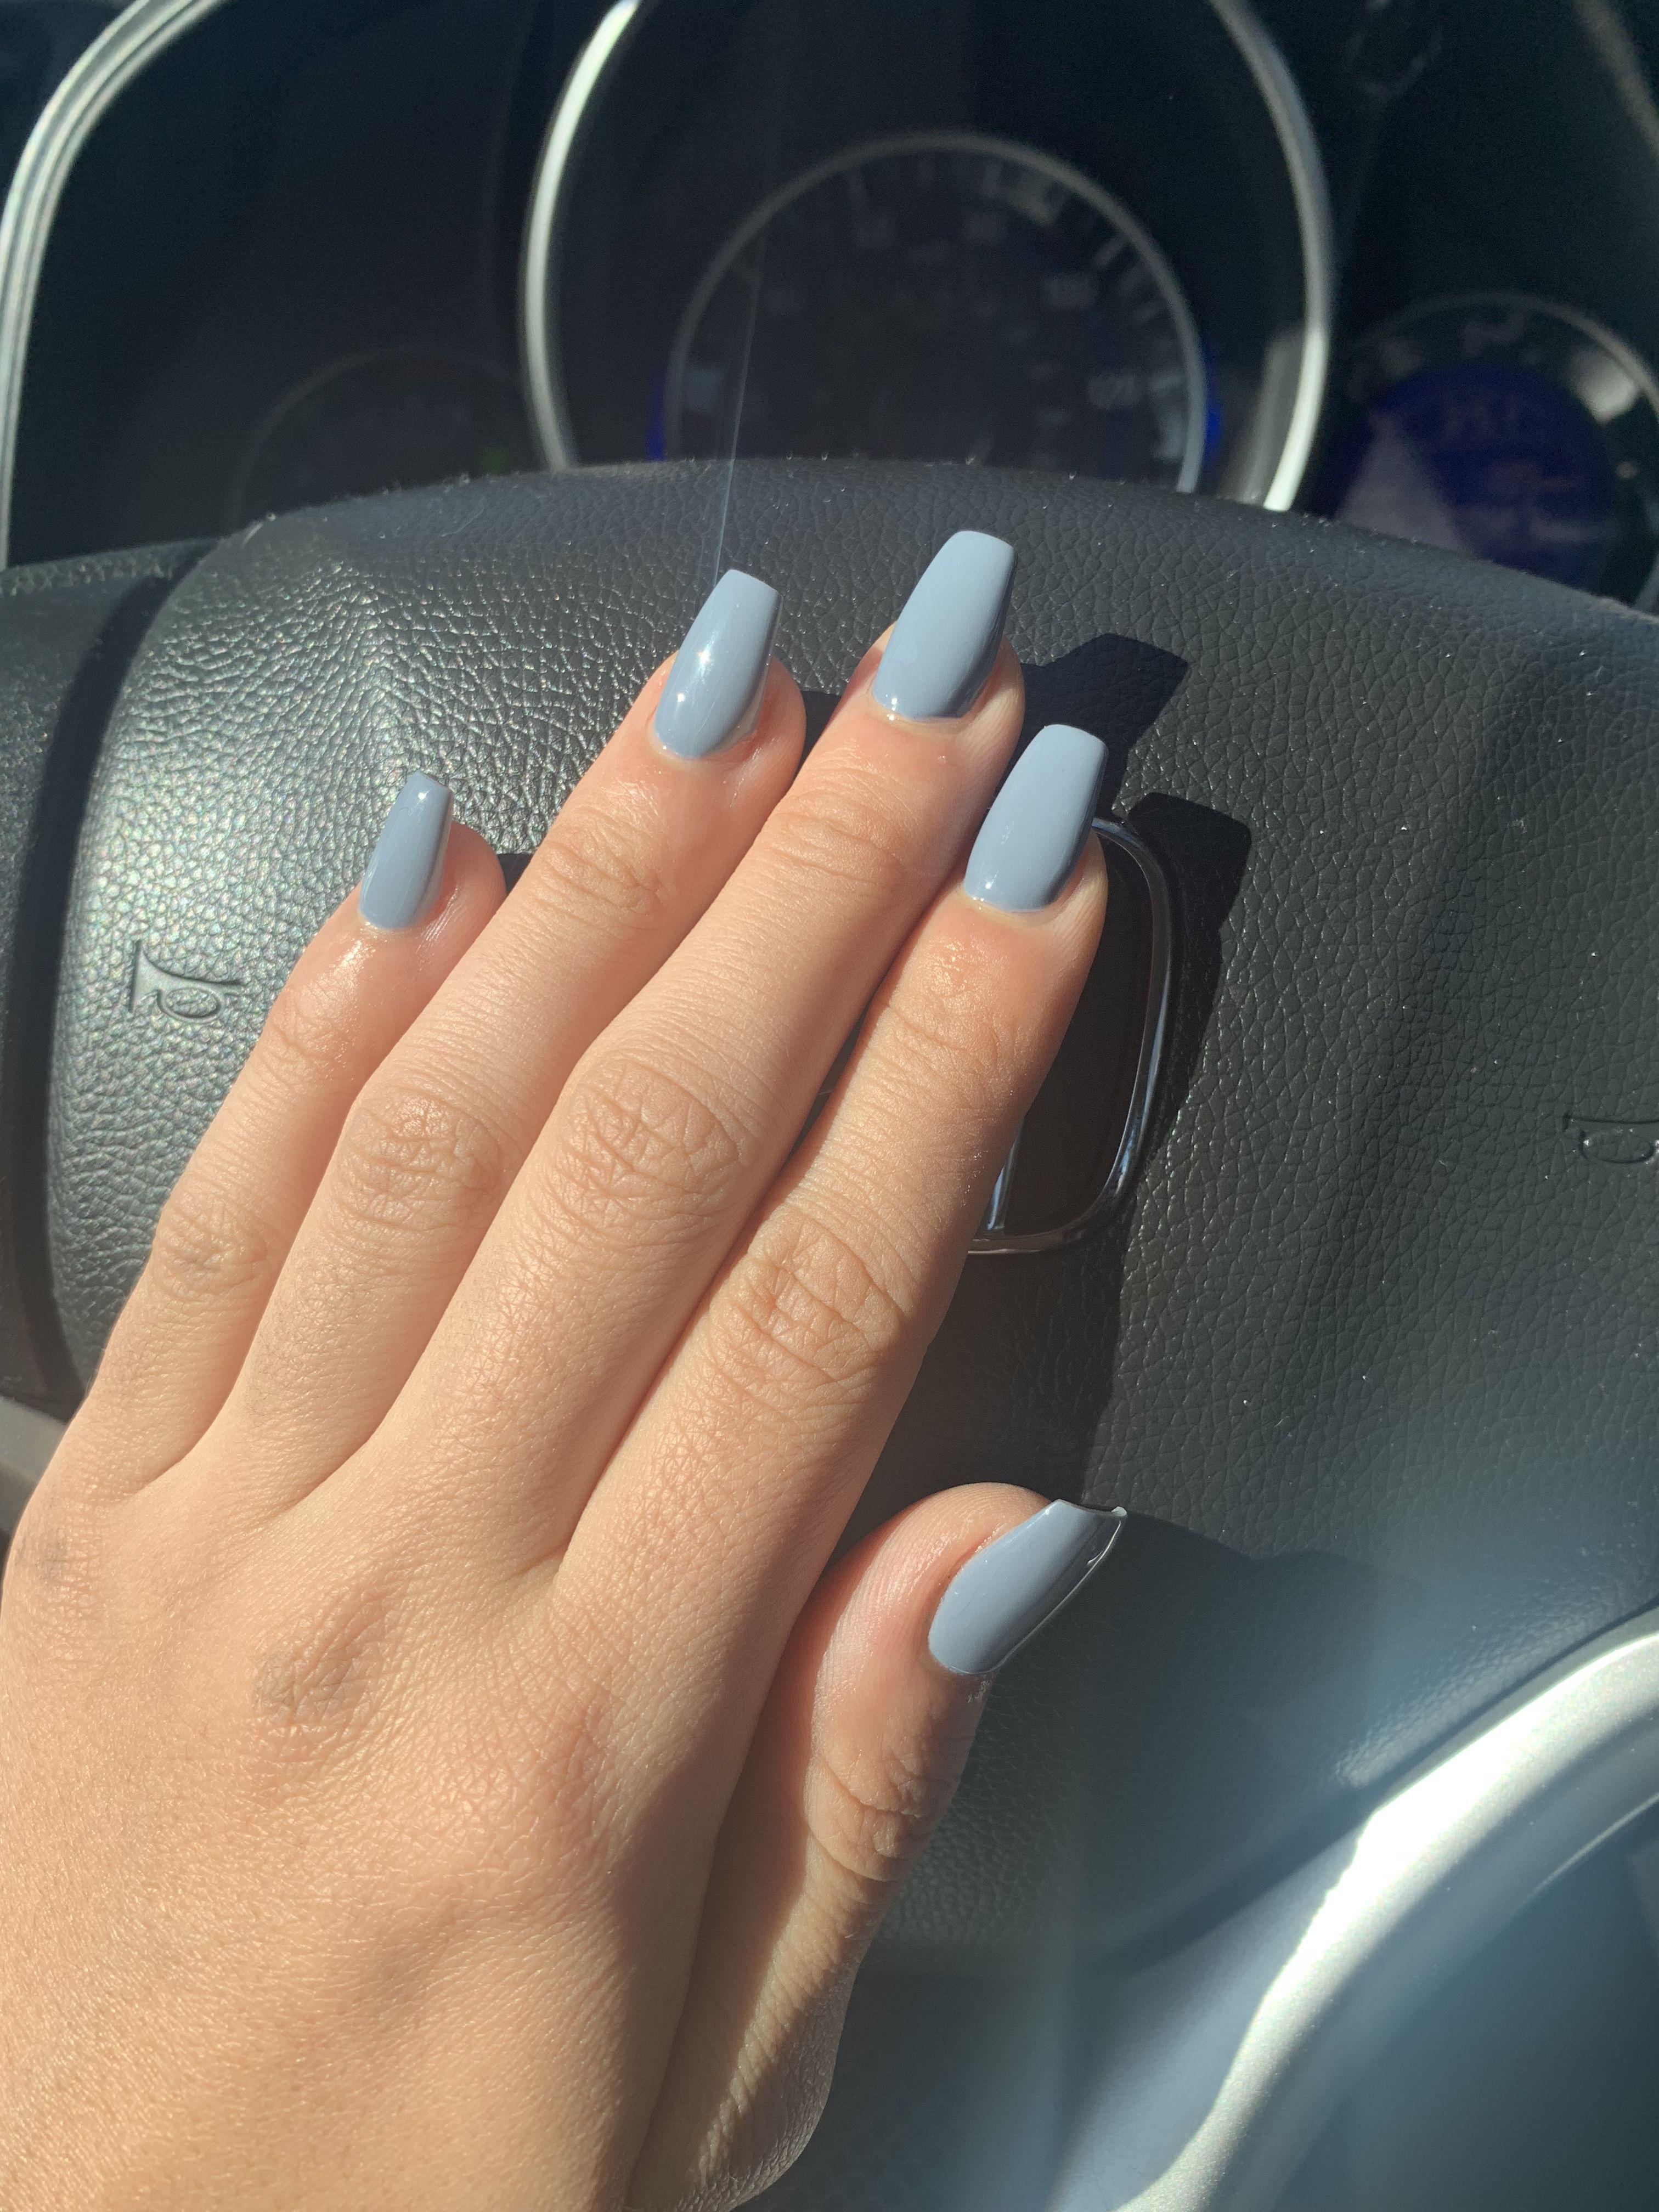 Short And Natural Coffin Nails Light Blue Grey Color Acrylic Nails Light Blue Blue Acrylic Nails Short Coffin Nails